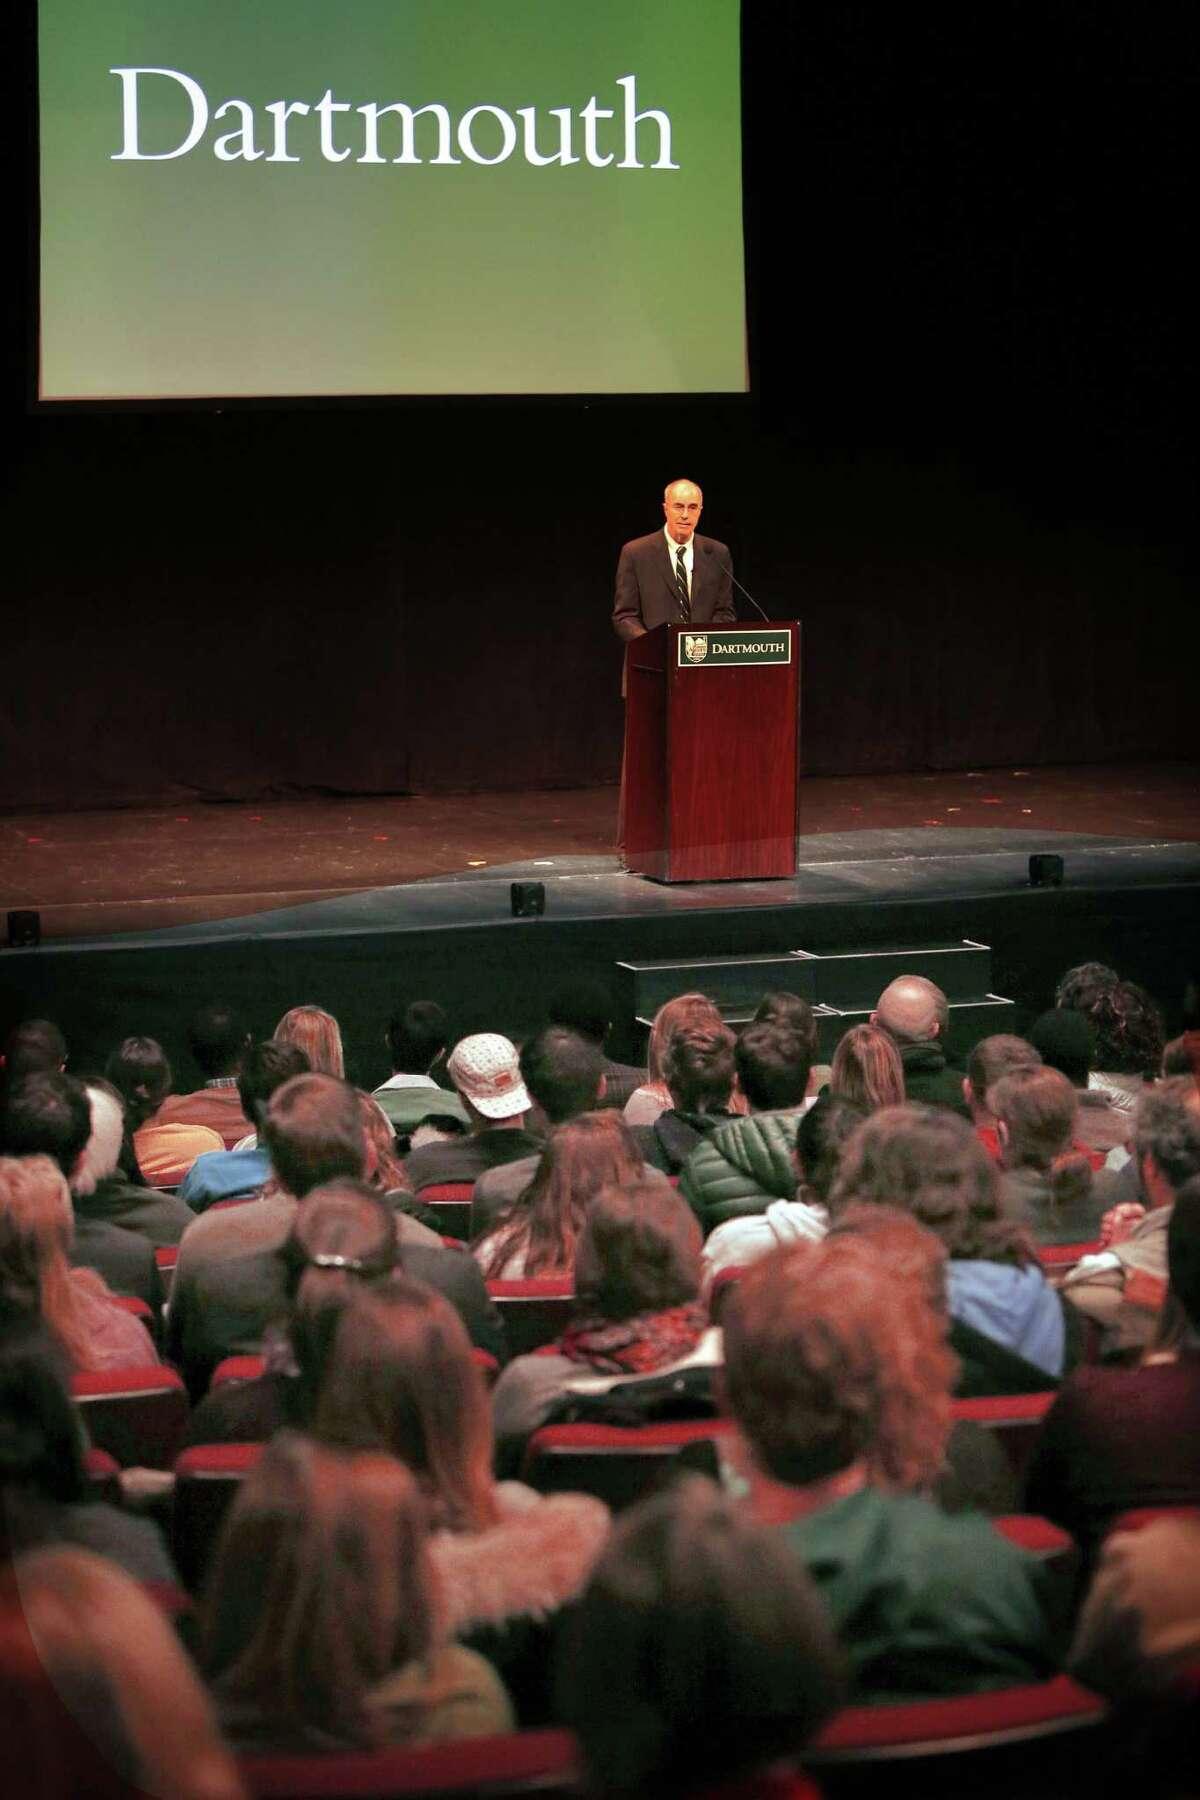 25. Dartmouth College - $4.47 billion endowment Hanover, New Hampshire, USA